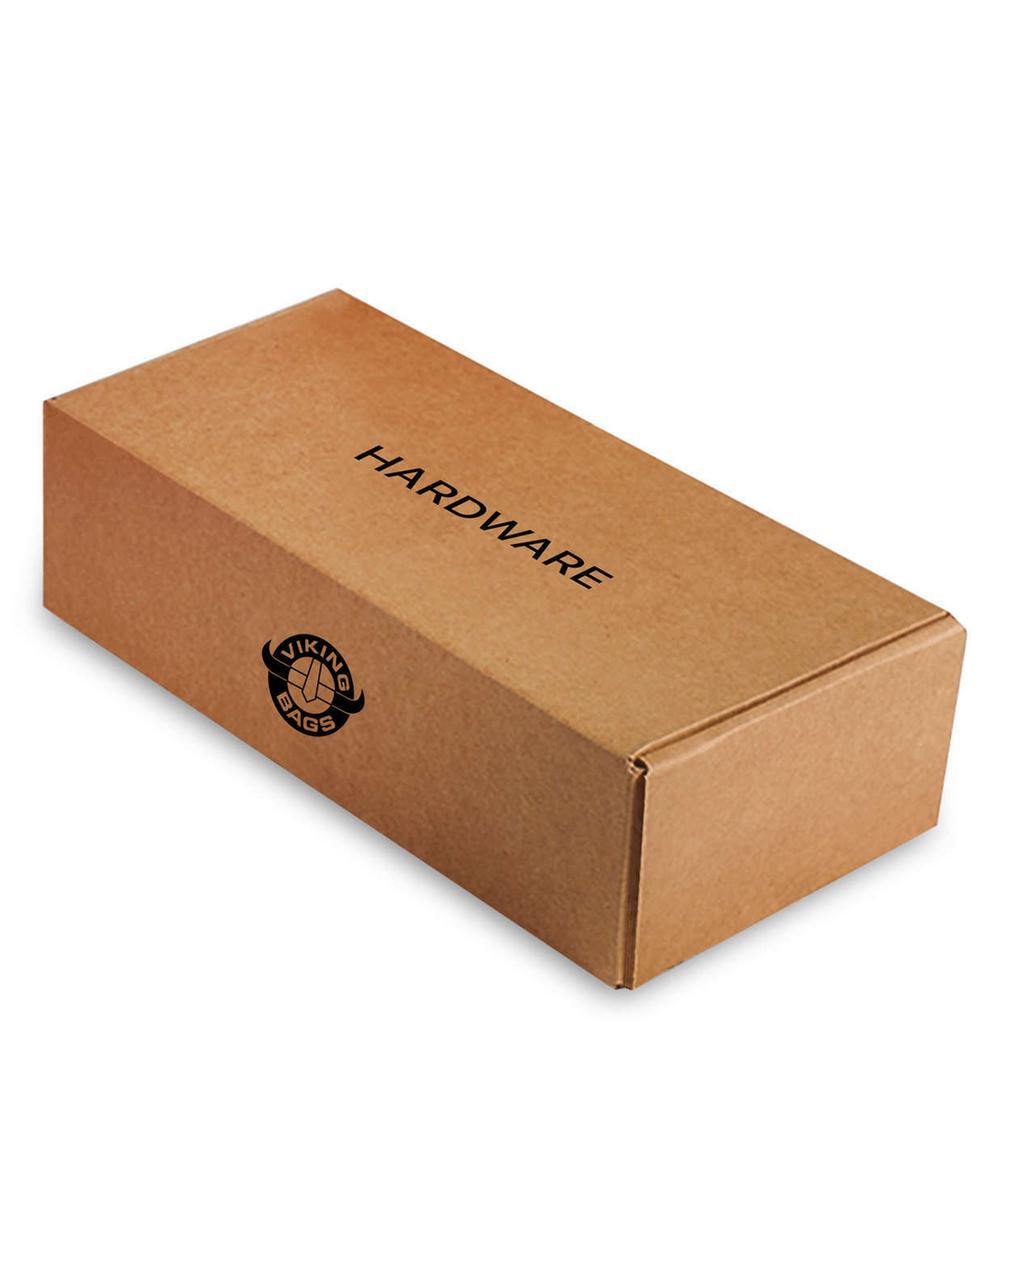 Triumph Thunderbird Shock Cutout Motorcycle Saddlebags Box